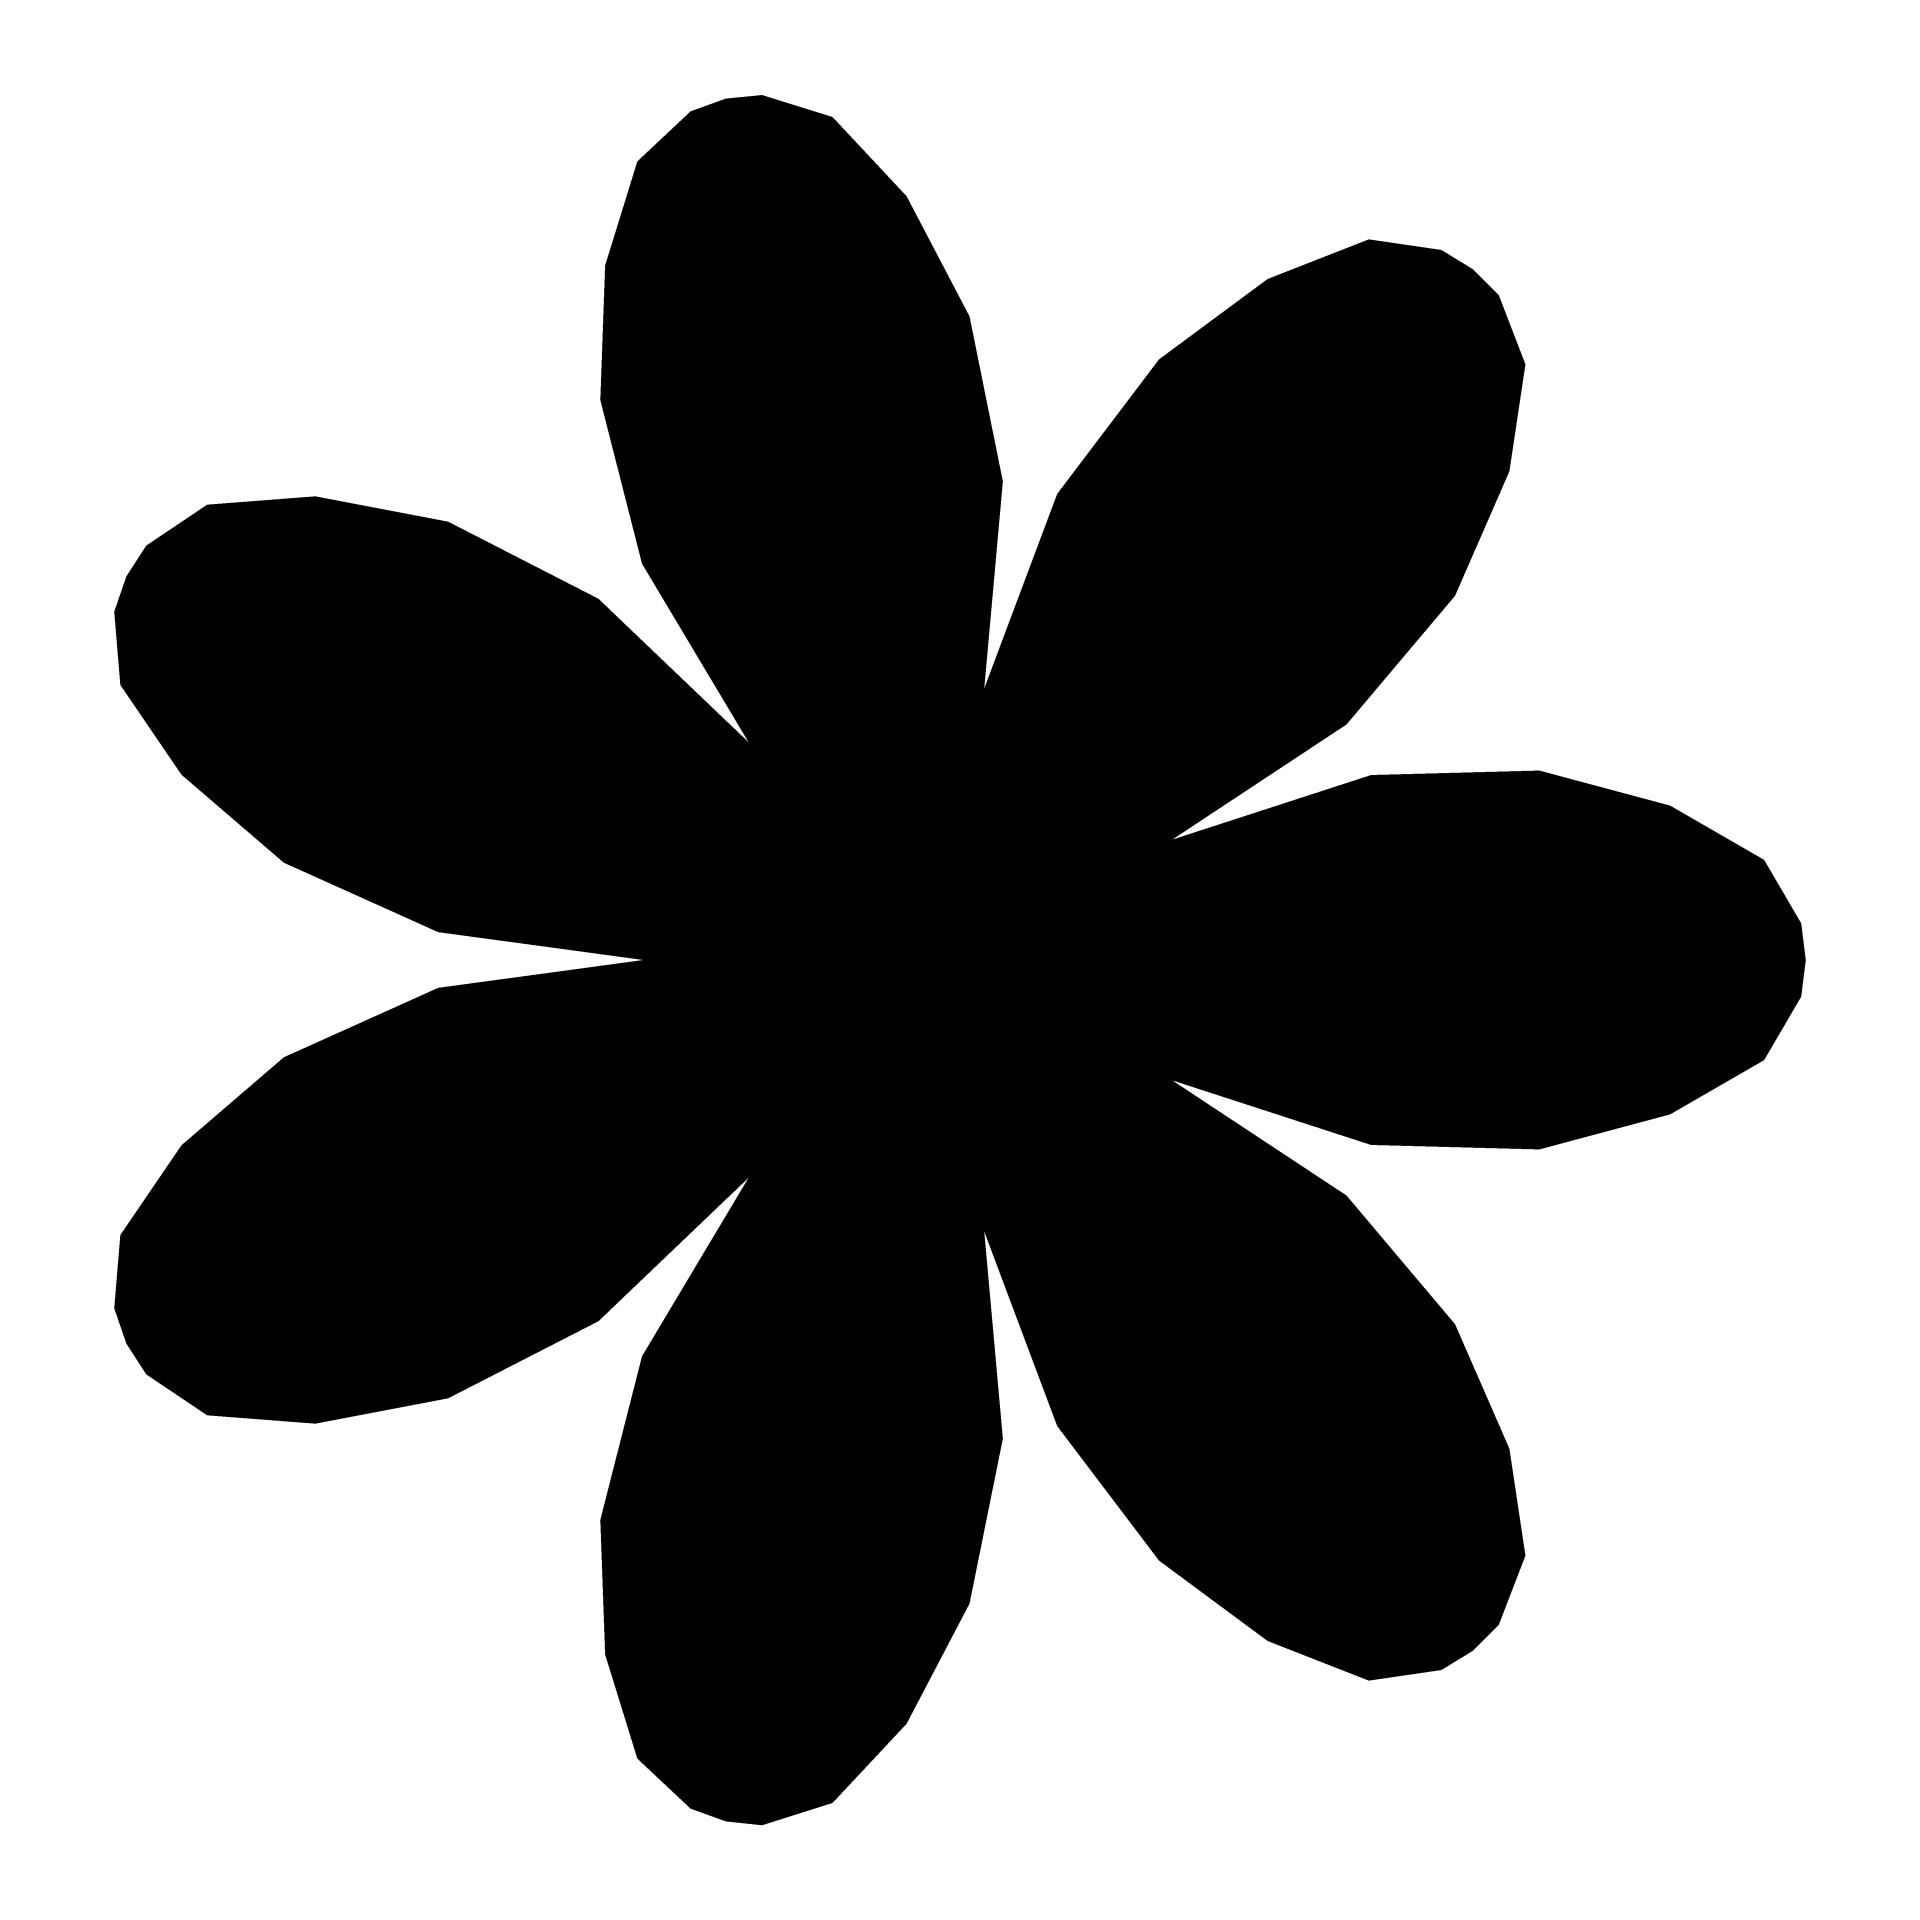 1920x1920 Petal Flower Silhouette Free Stock Photo